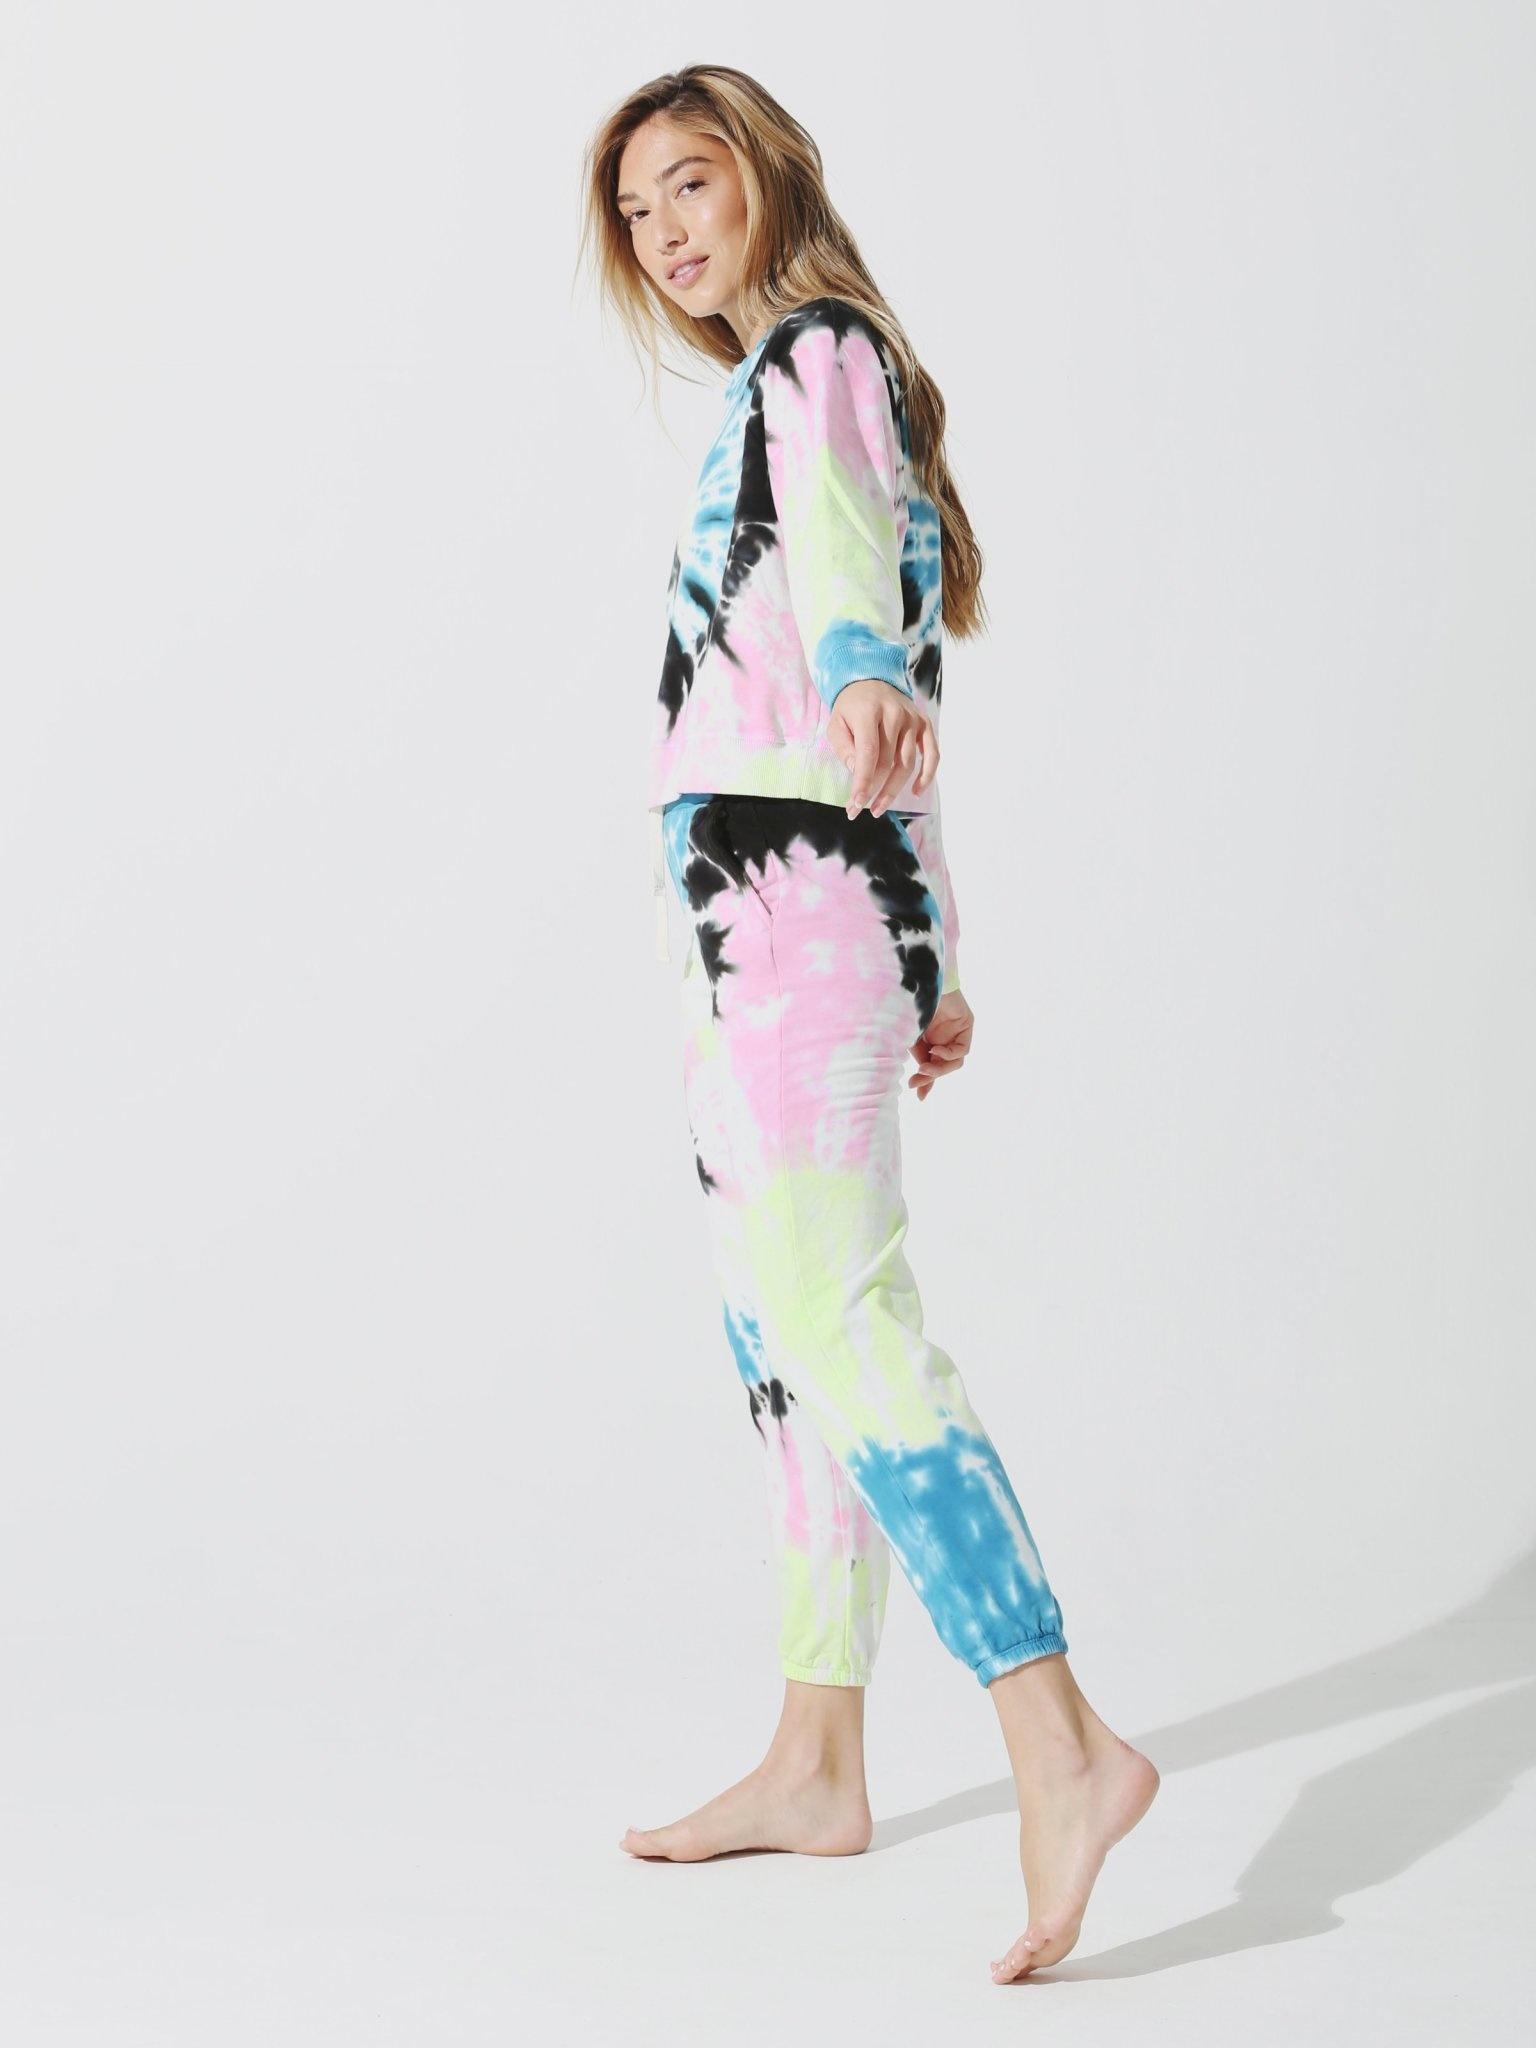 Electric & Rose Vendimia Jogger Wave Balboa Blue/Neon/Camille